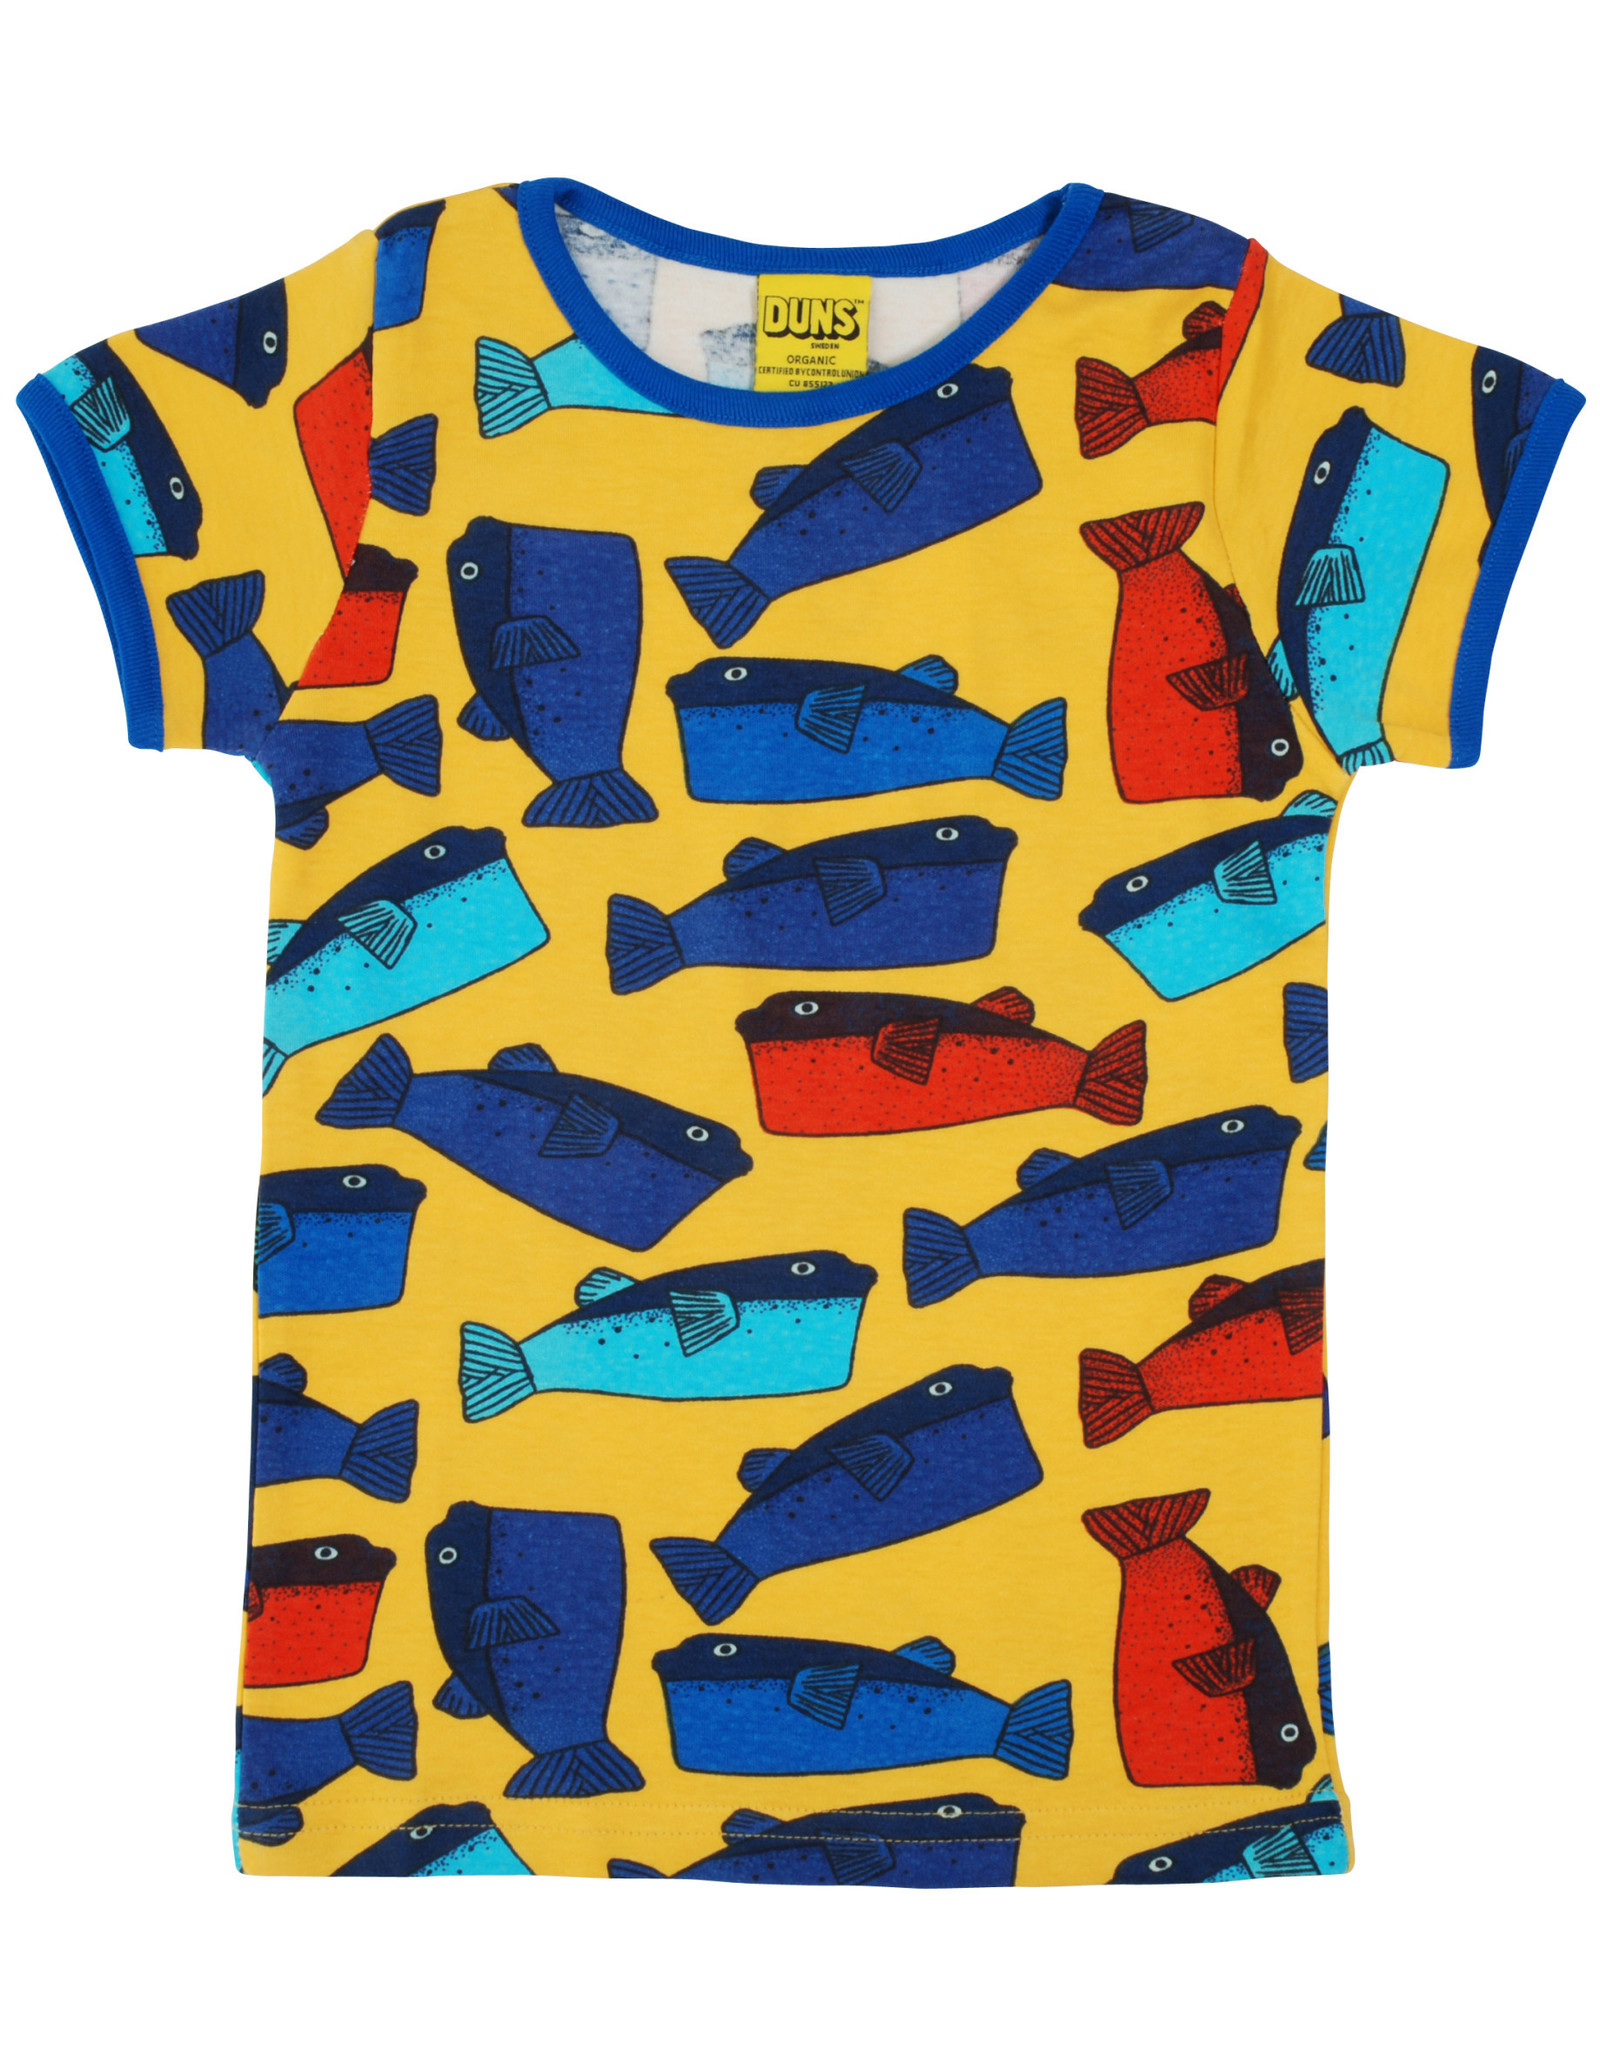 Duns Groene OF gele T-shirt met vissen